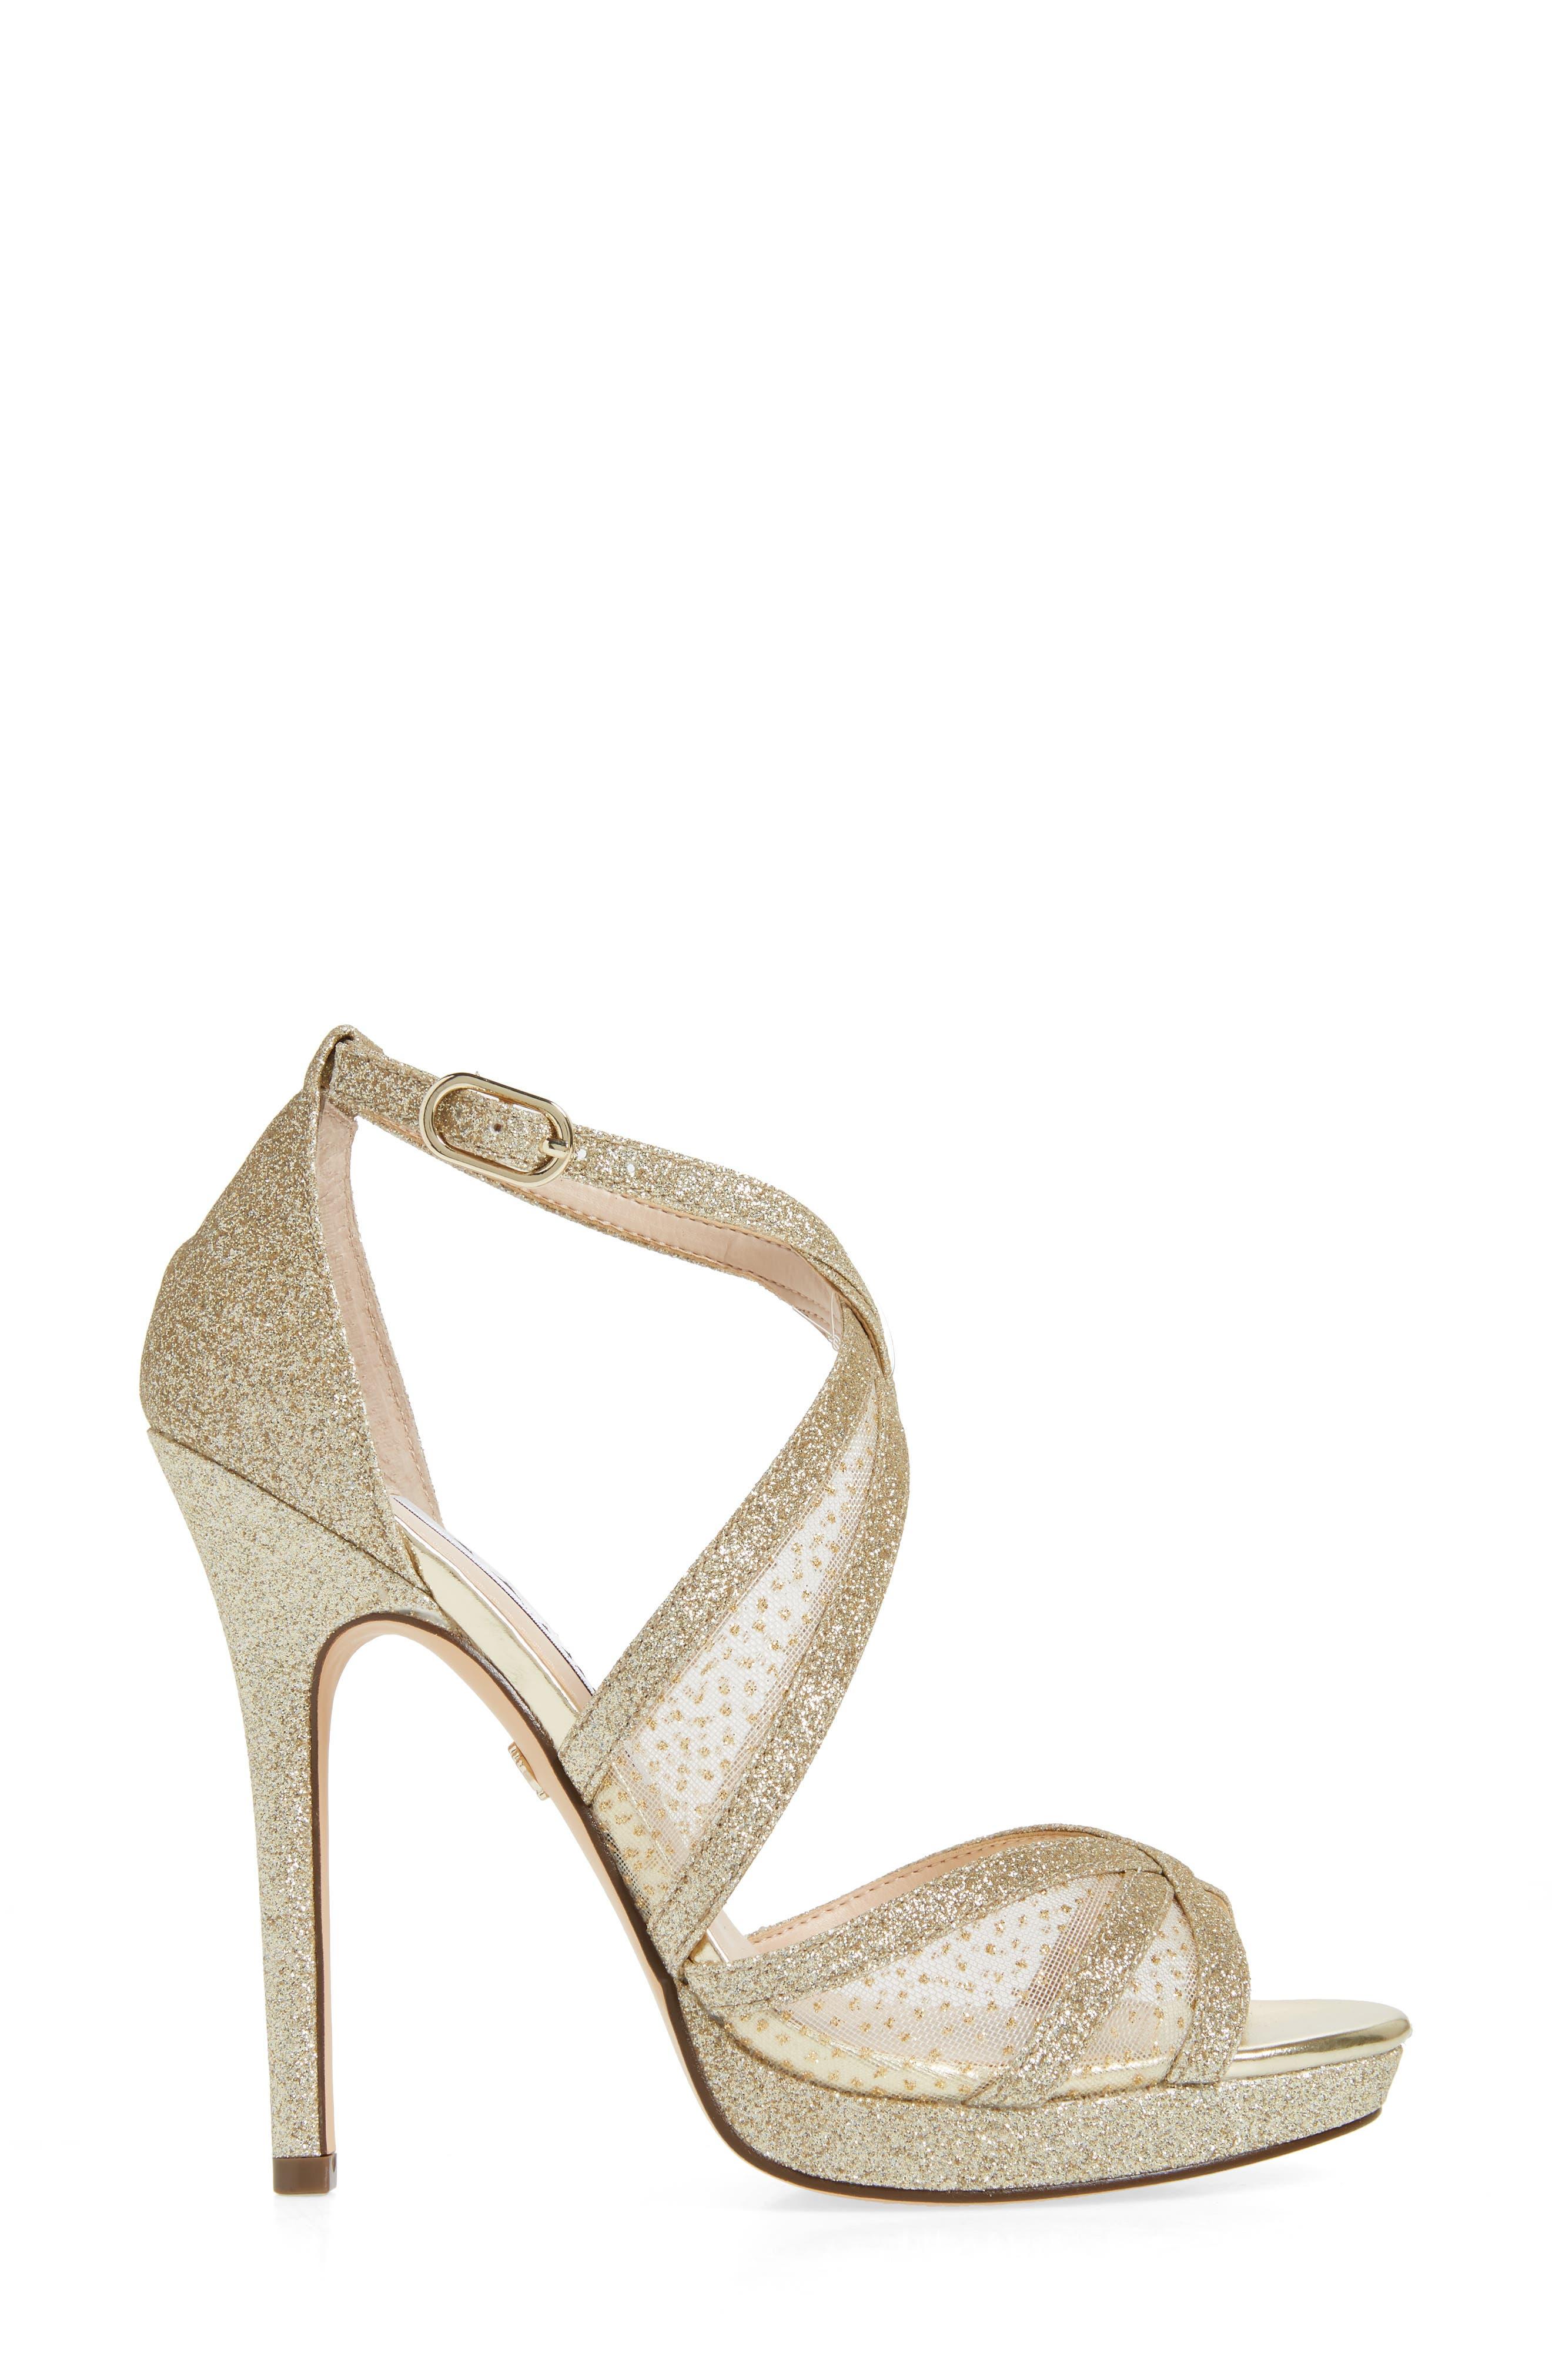 NINA, Fenna Strappy Platform Sandal, Alternate thumbnail 3, color, GOLD GLITTER FABRIC